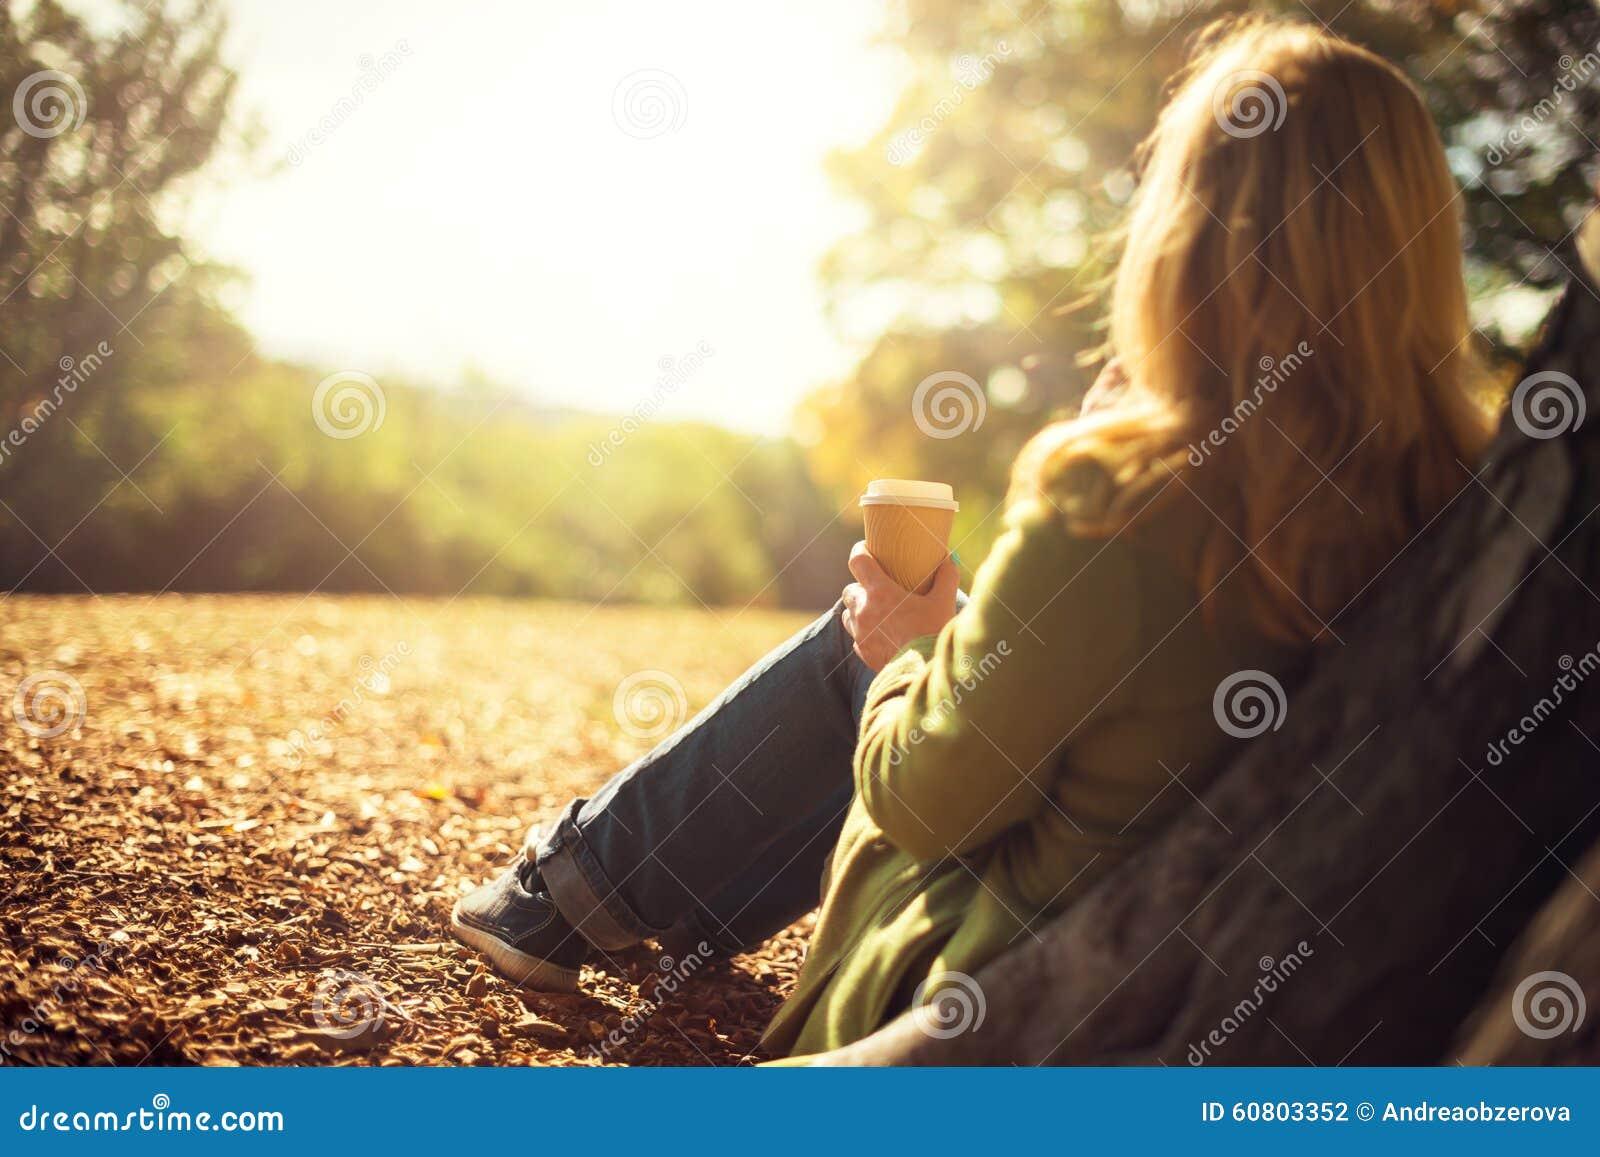 Woman enjoying takeaway coffee cup on sunny cold fall day